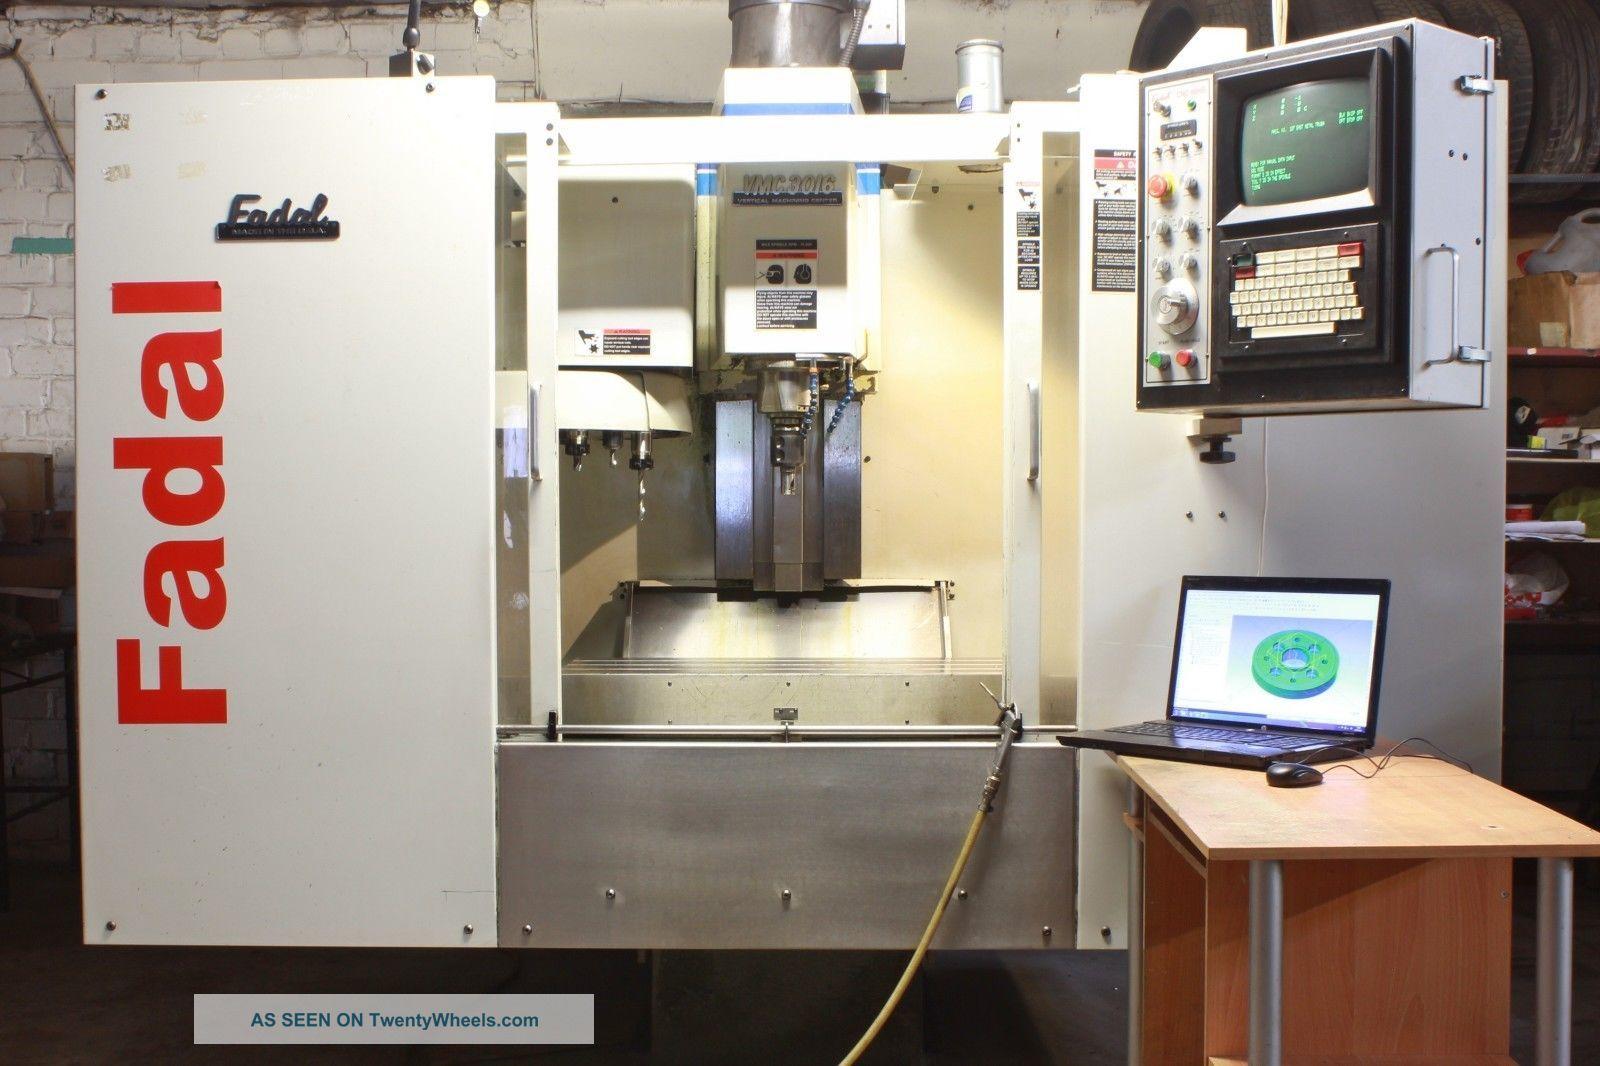 Cnc Milling Machine Fadal Vmc 3016ht Model 904 - L (1997) 3 - Axis Milling Machines photo